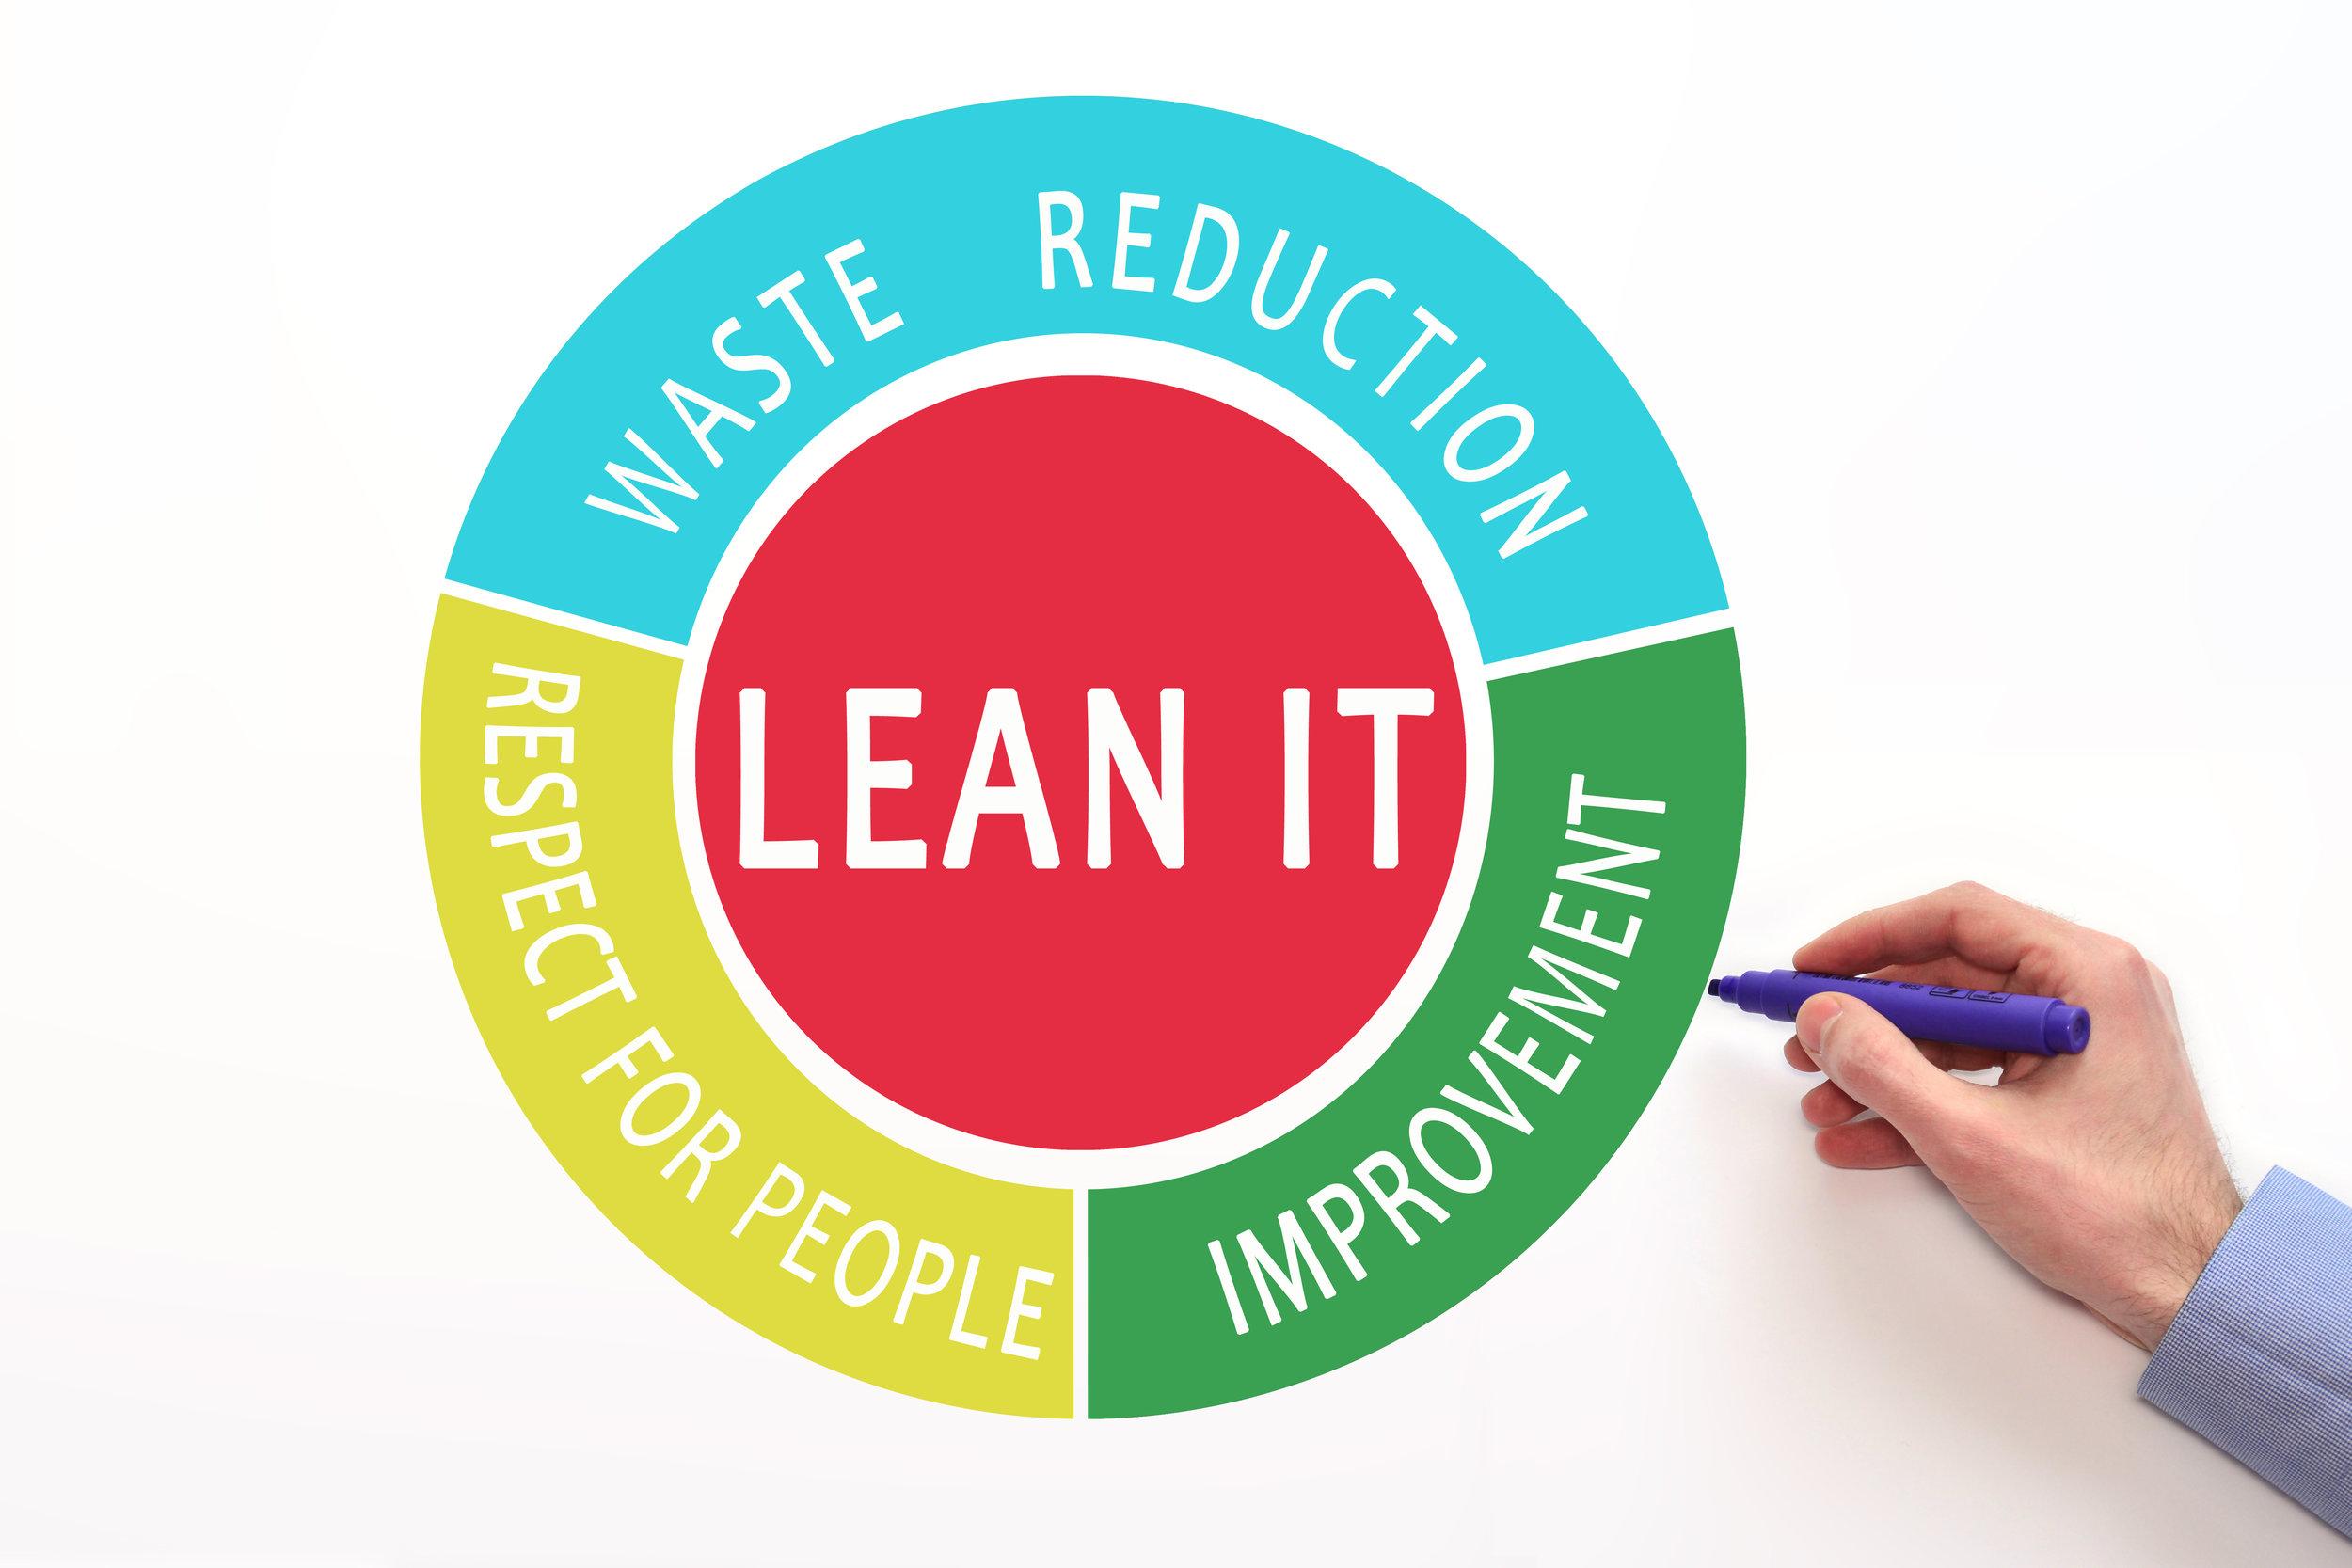 Lean Principle Circle.jpg